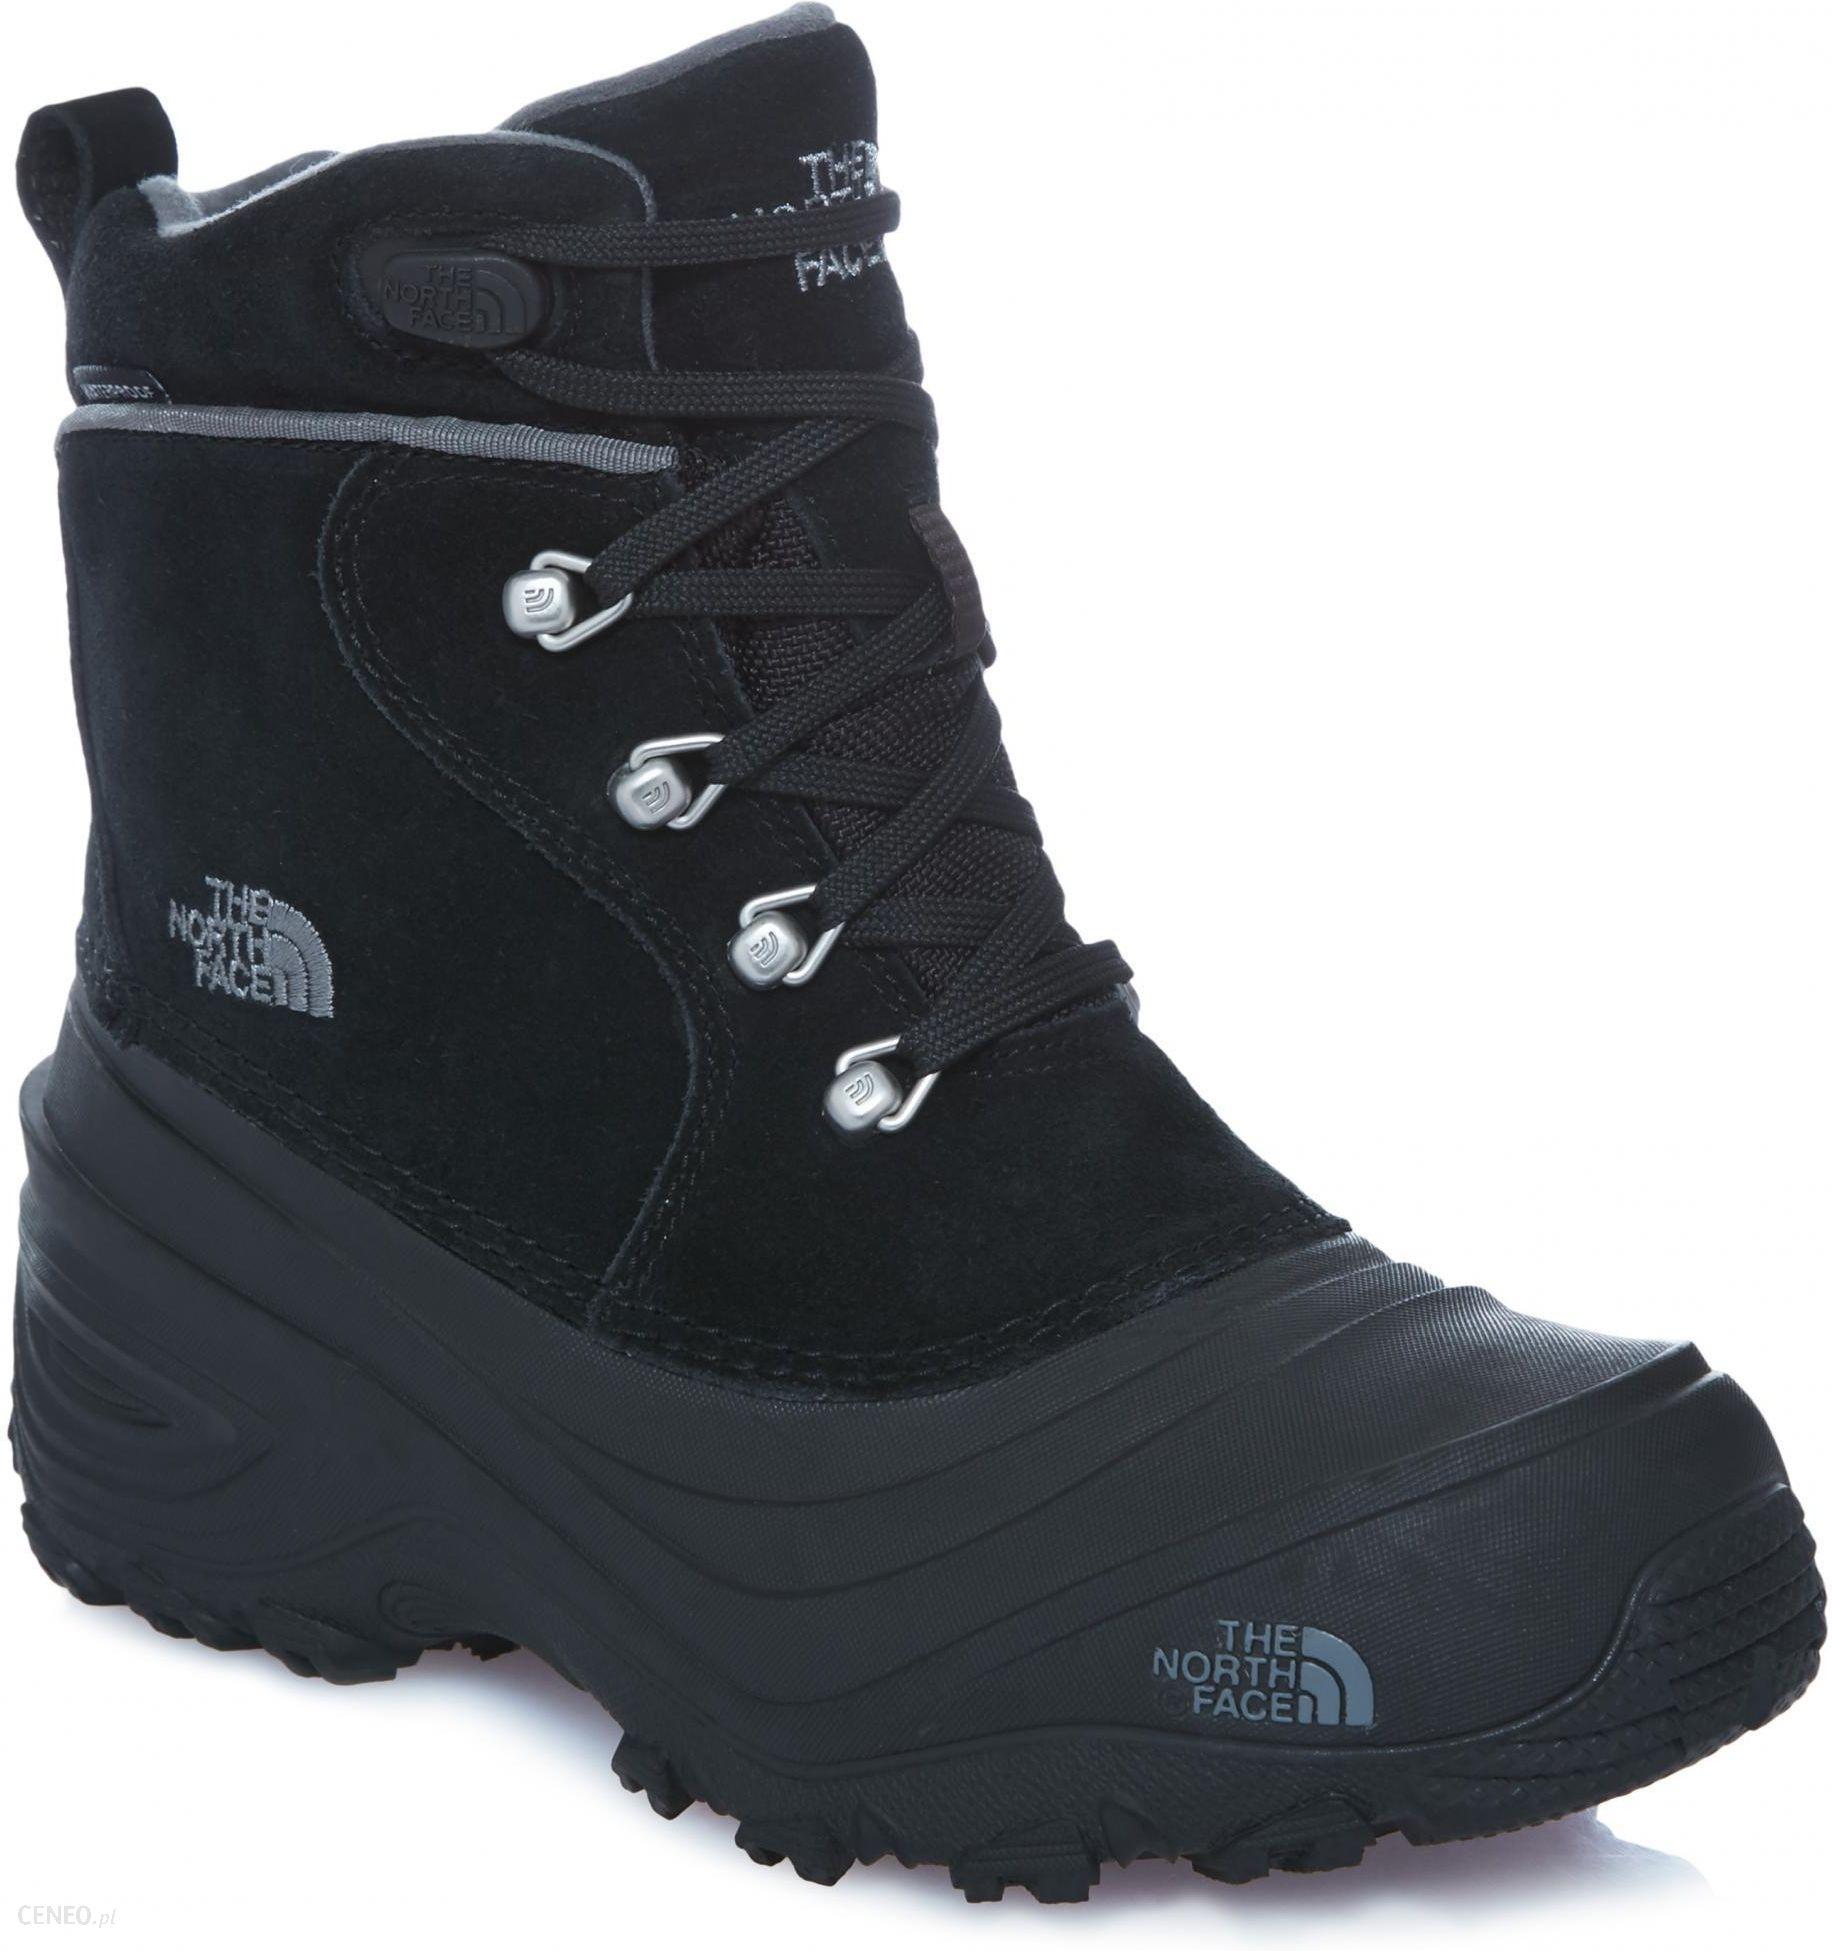 The North Face buty zimowe Y Chilkat Lace II Tnf czarny 31 Ceny i opinie Ceneo.pl